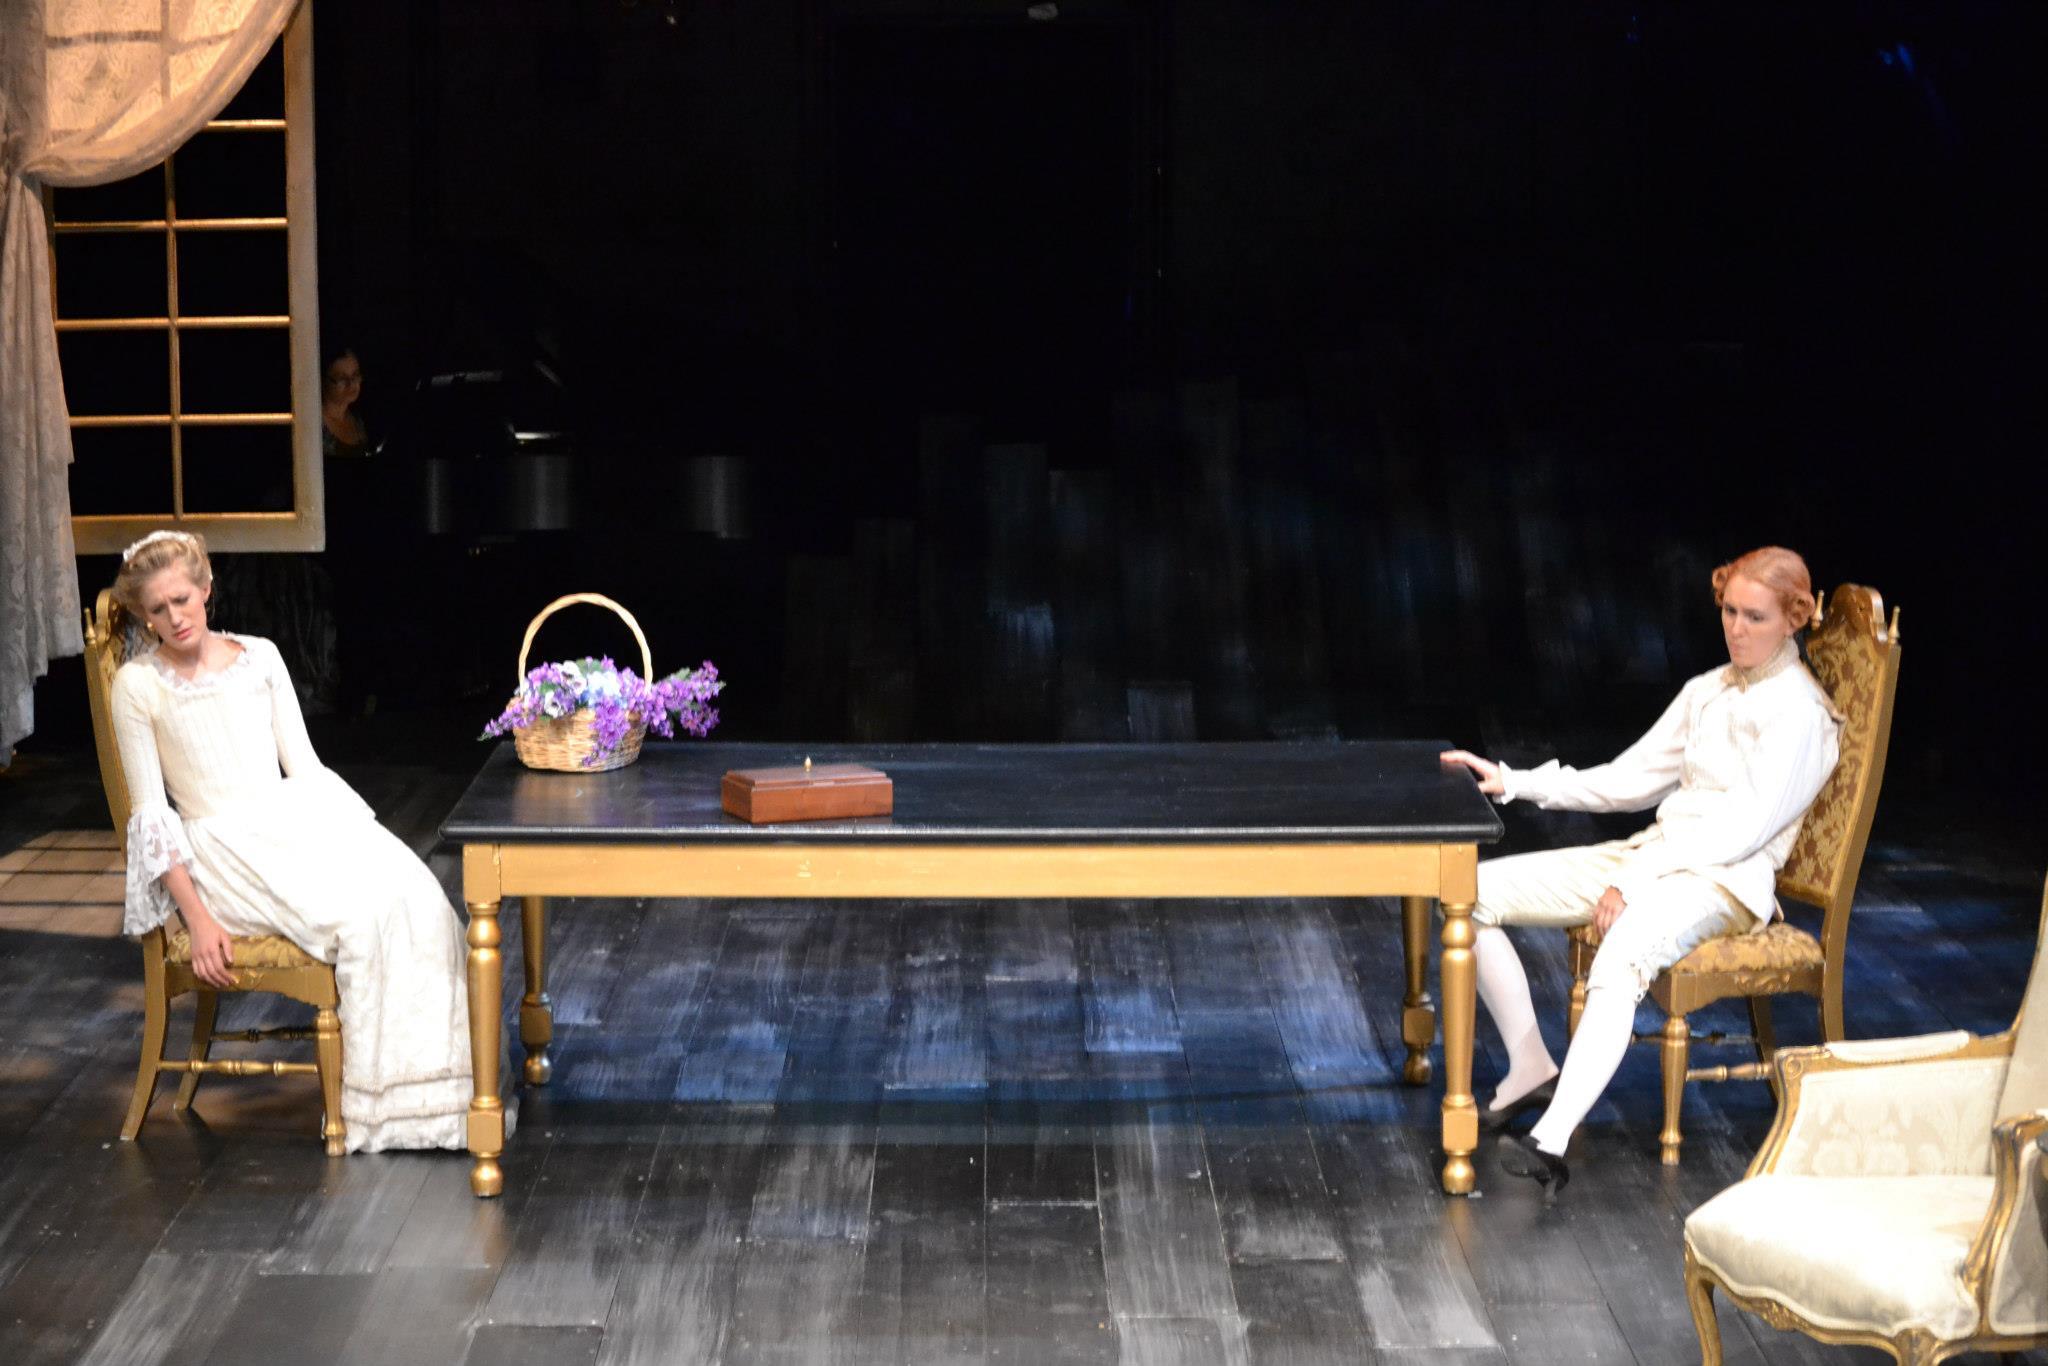 Aurore / Le portrait de Manon / Boston University / October 2012